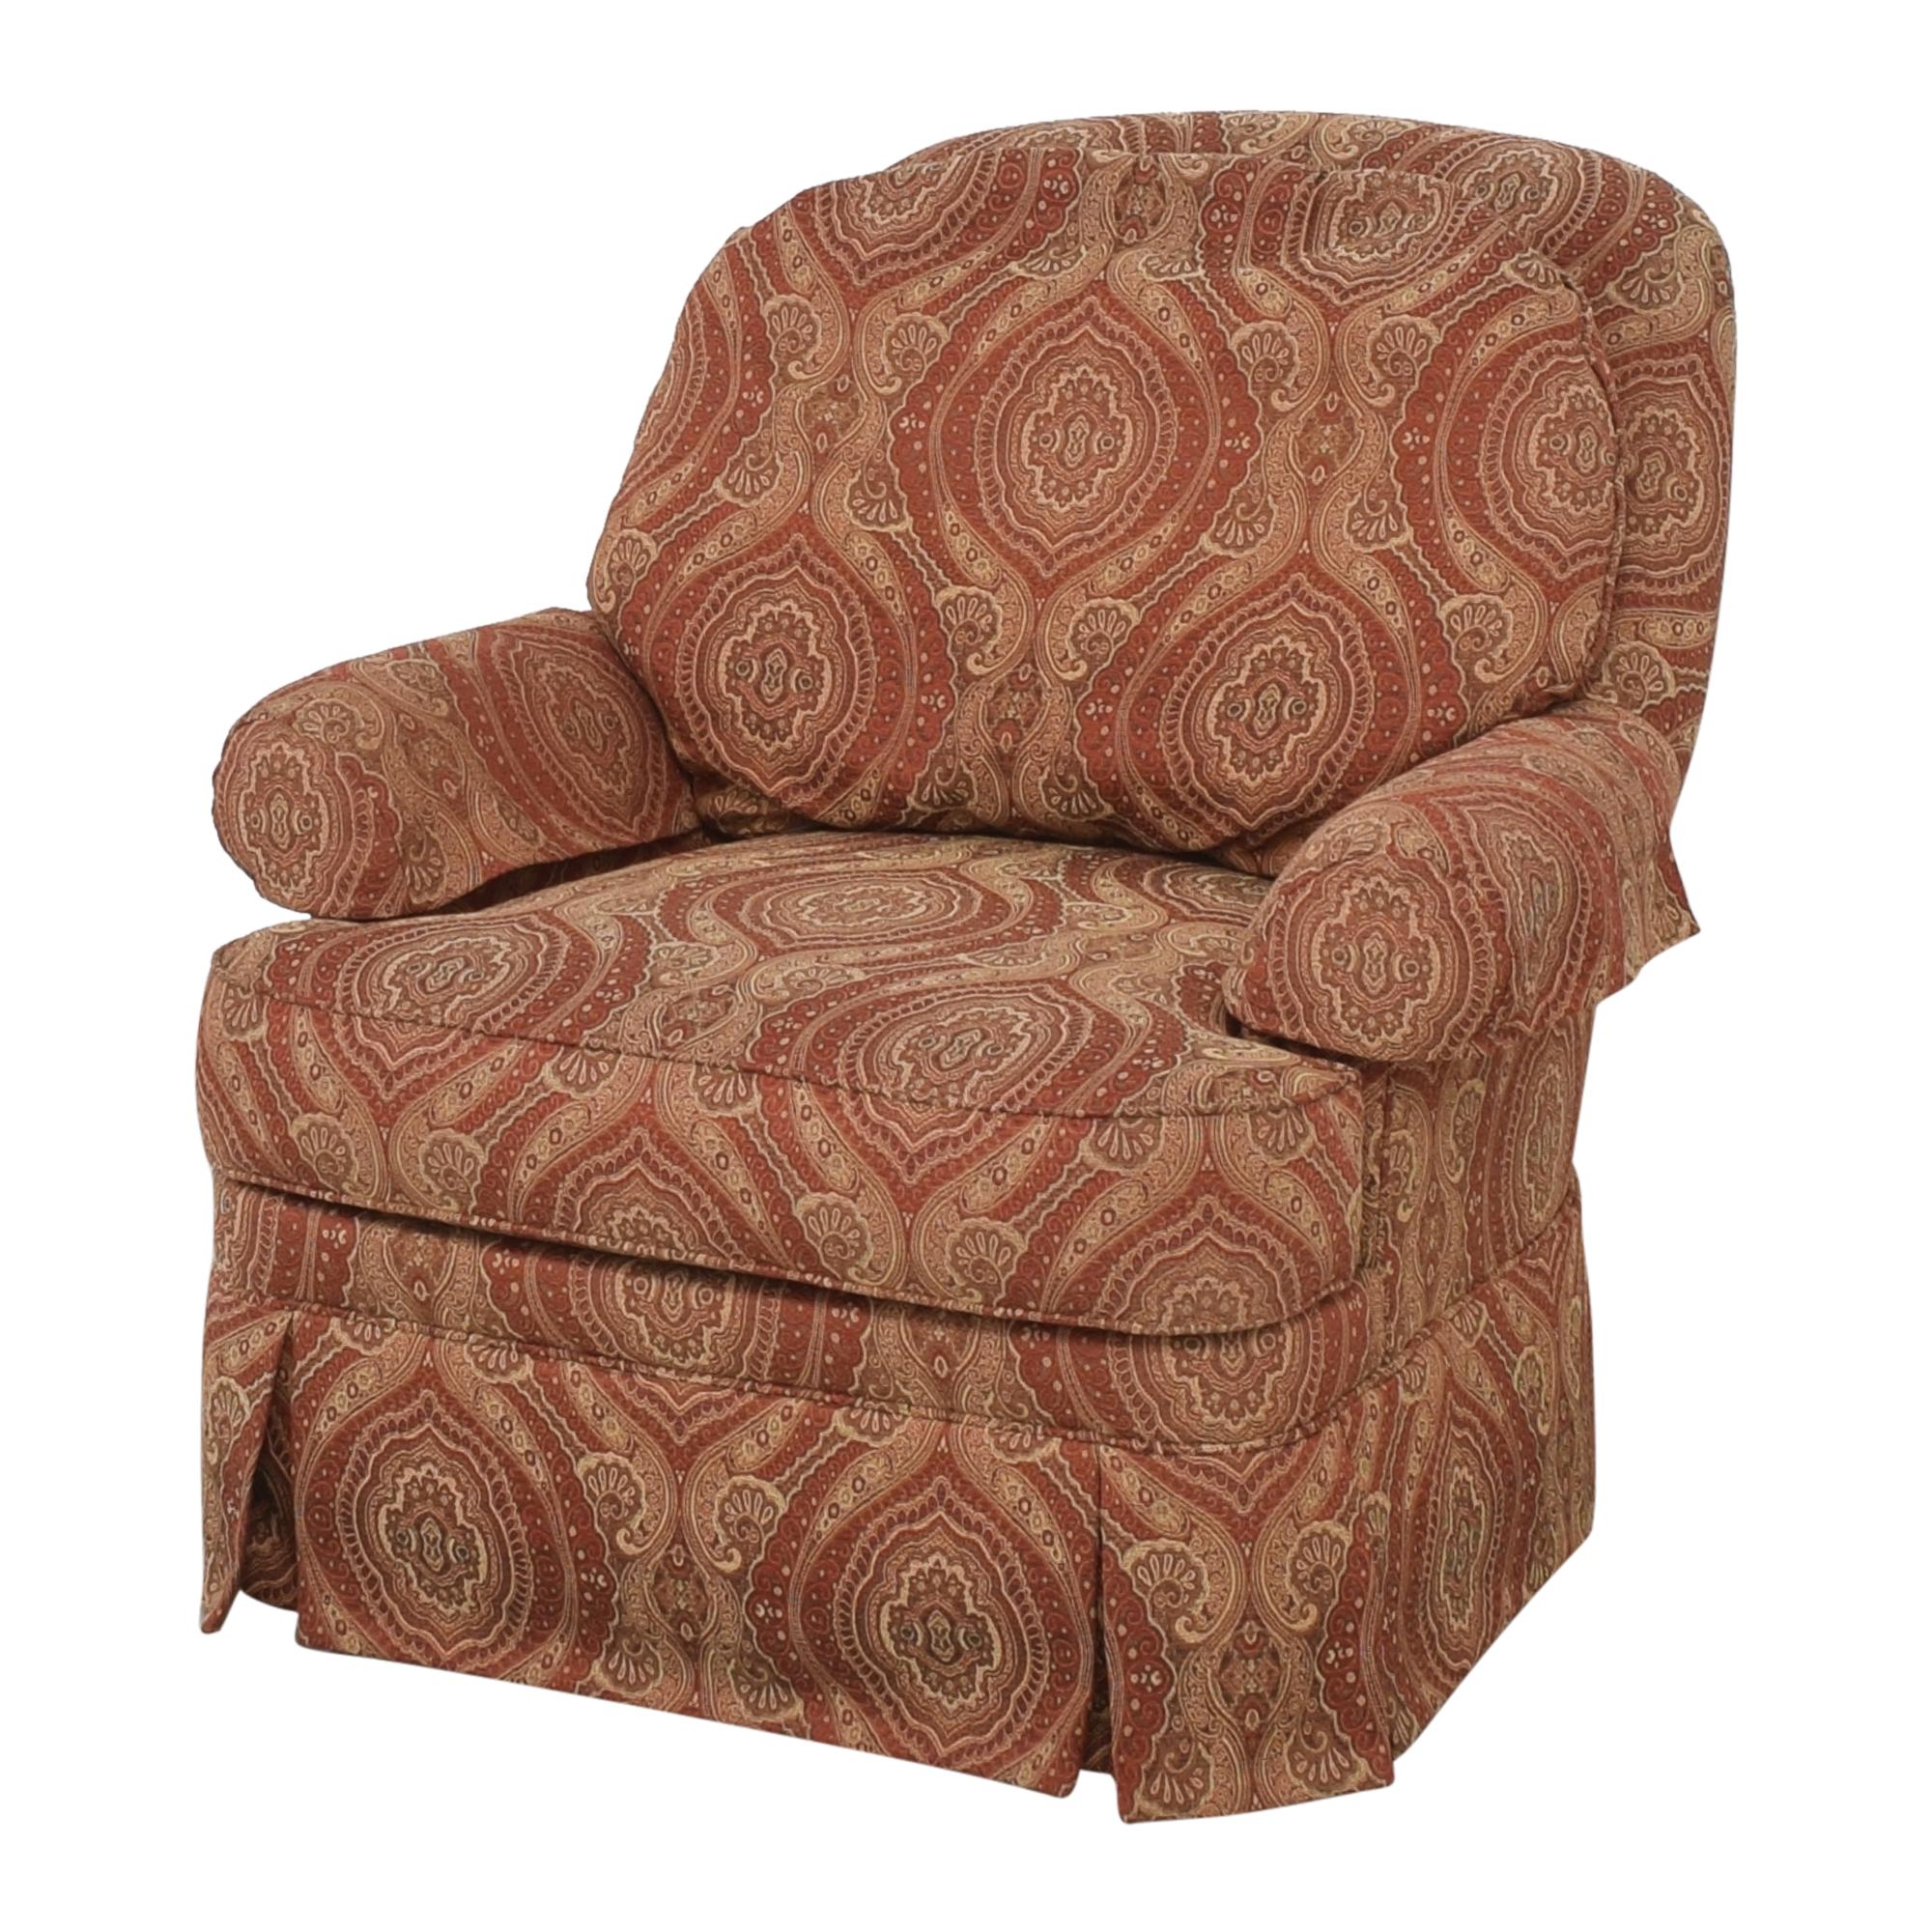 Ethan Allen Ethan Allen Swivel Chair with Ottoman nj